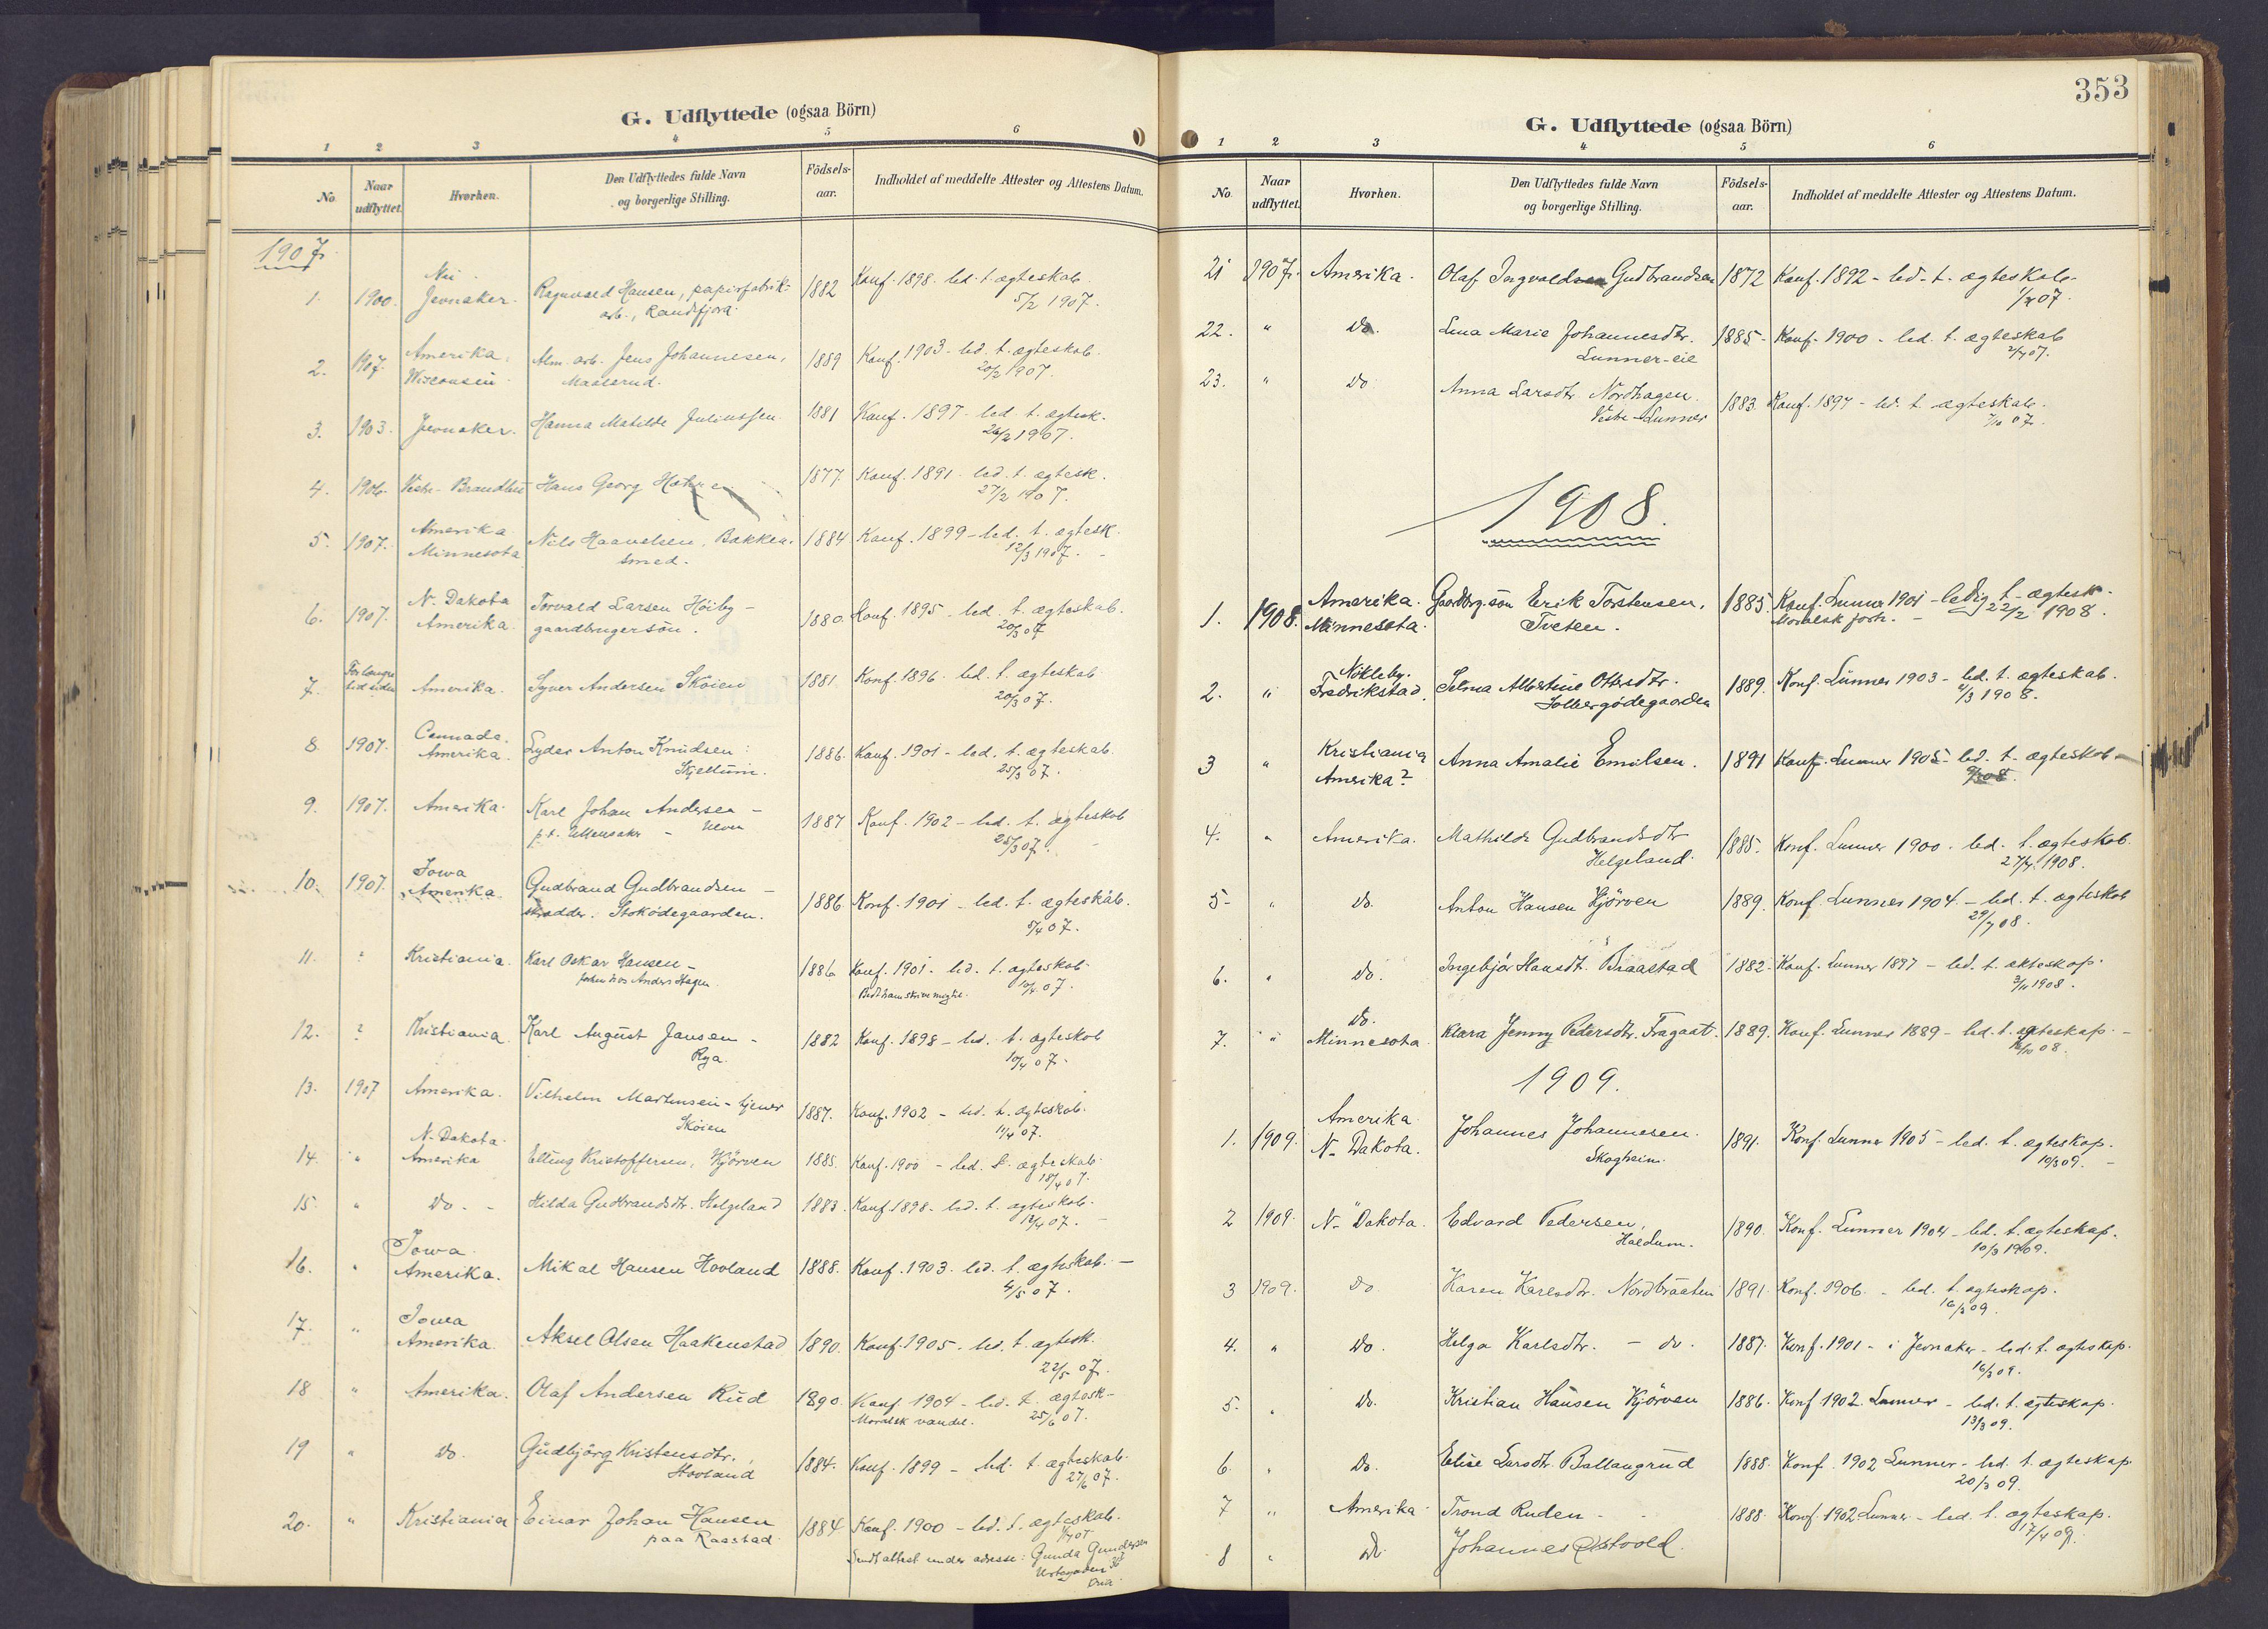 SAH, Lunner prestekontor, H/Ha/Haa/L0001: Ministerialbok nr. 1, 1907-1922, s. 353